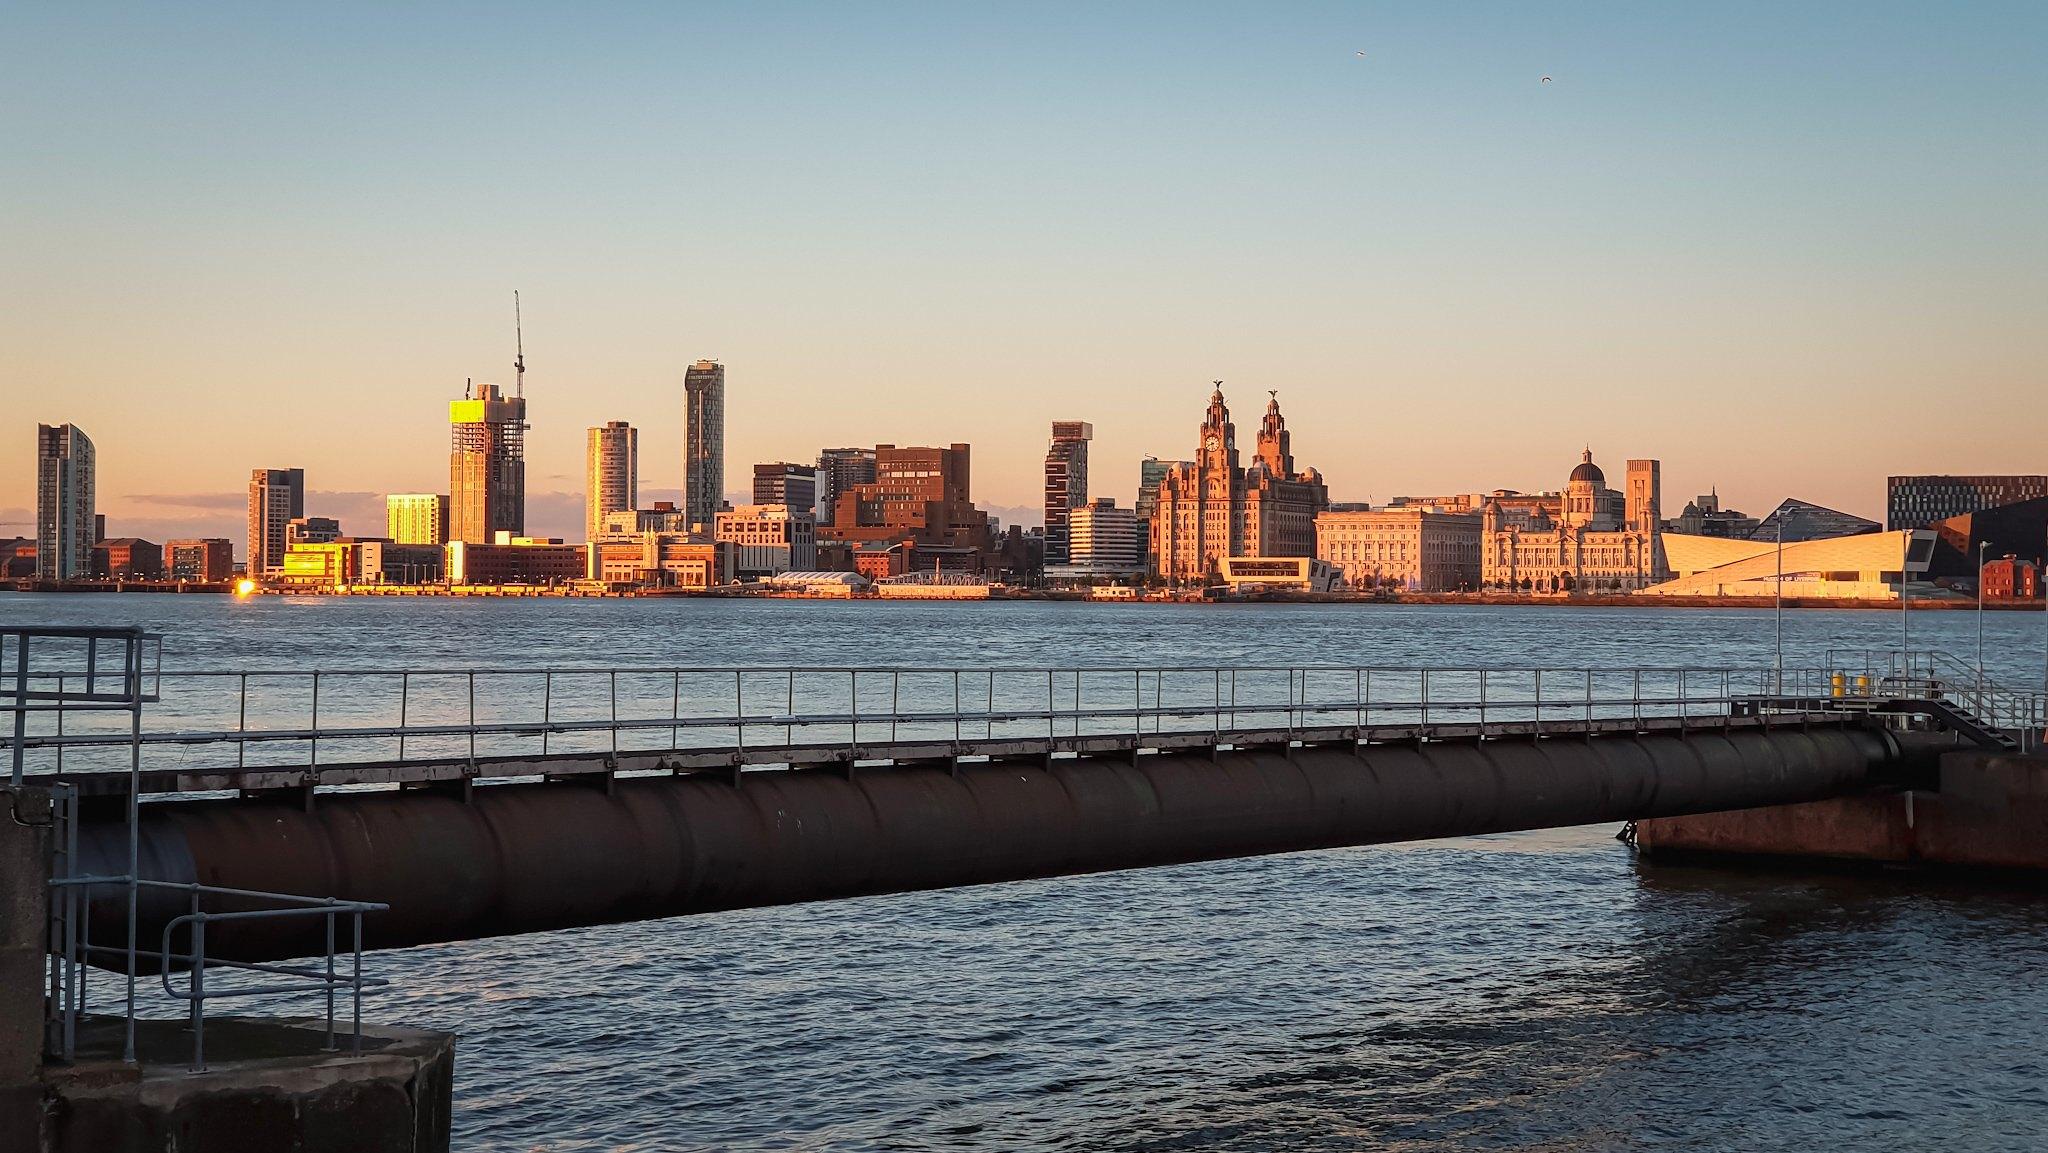 Liverpool Waterfront by Alfie Sparrow.jpg